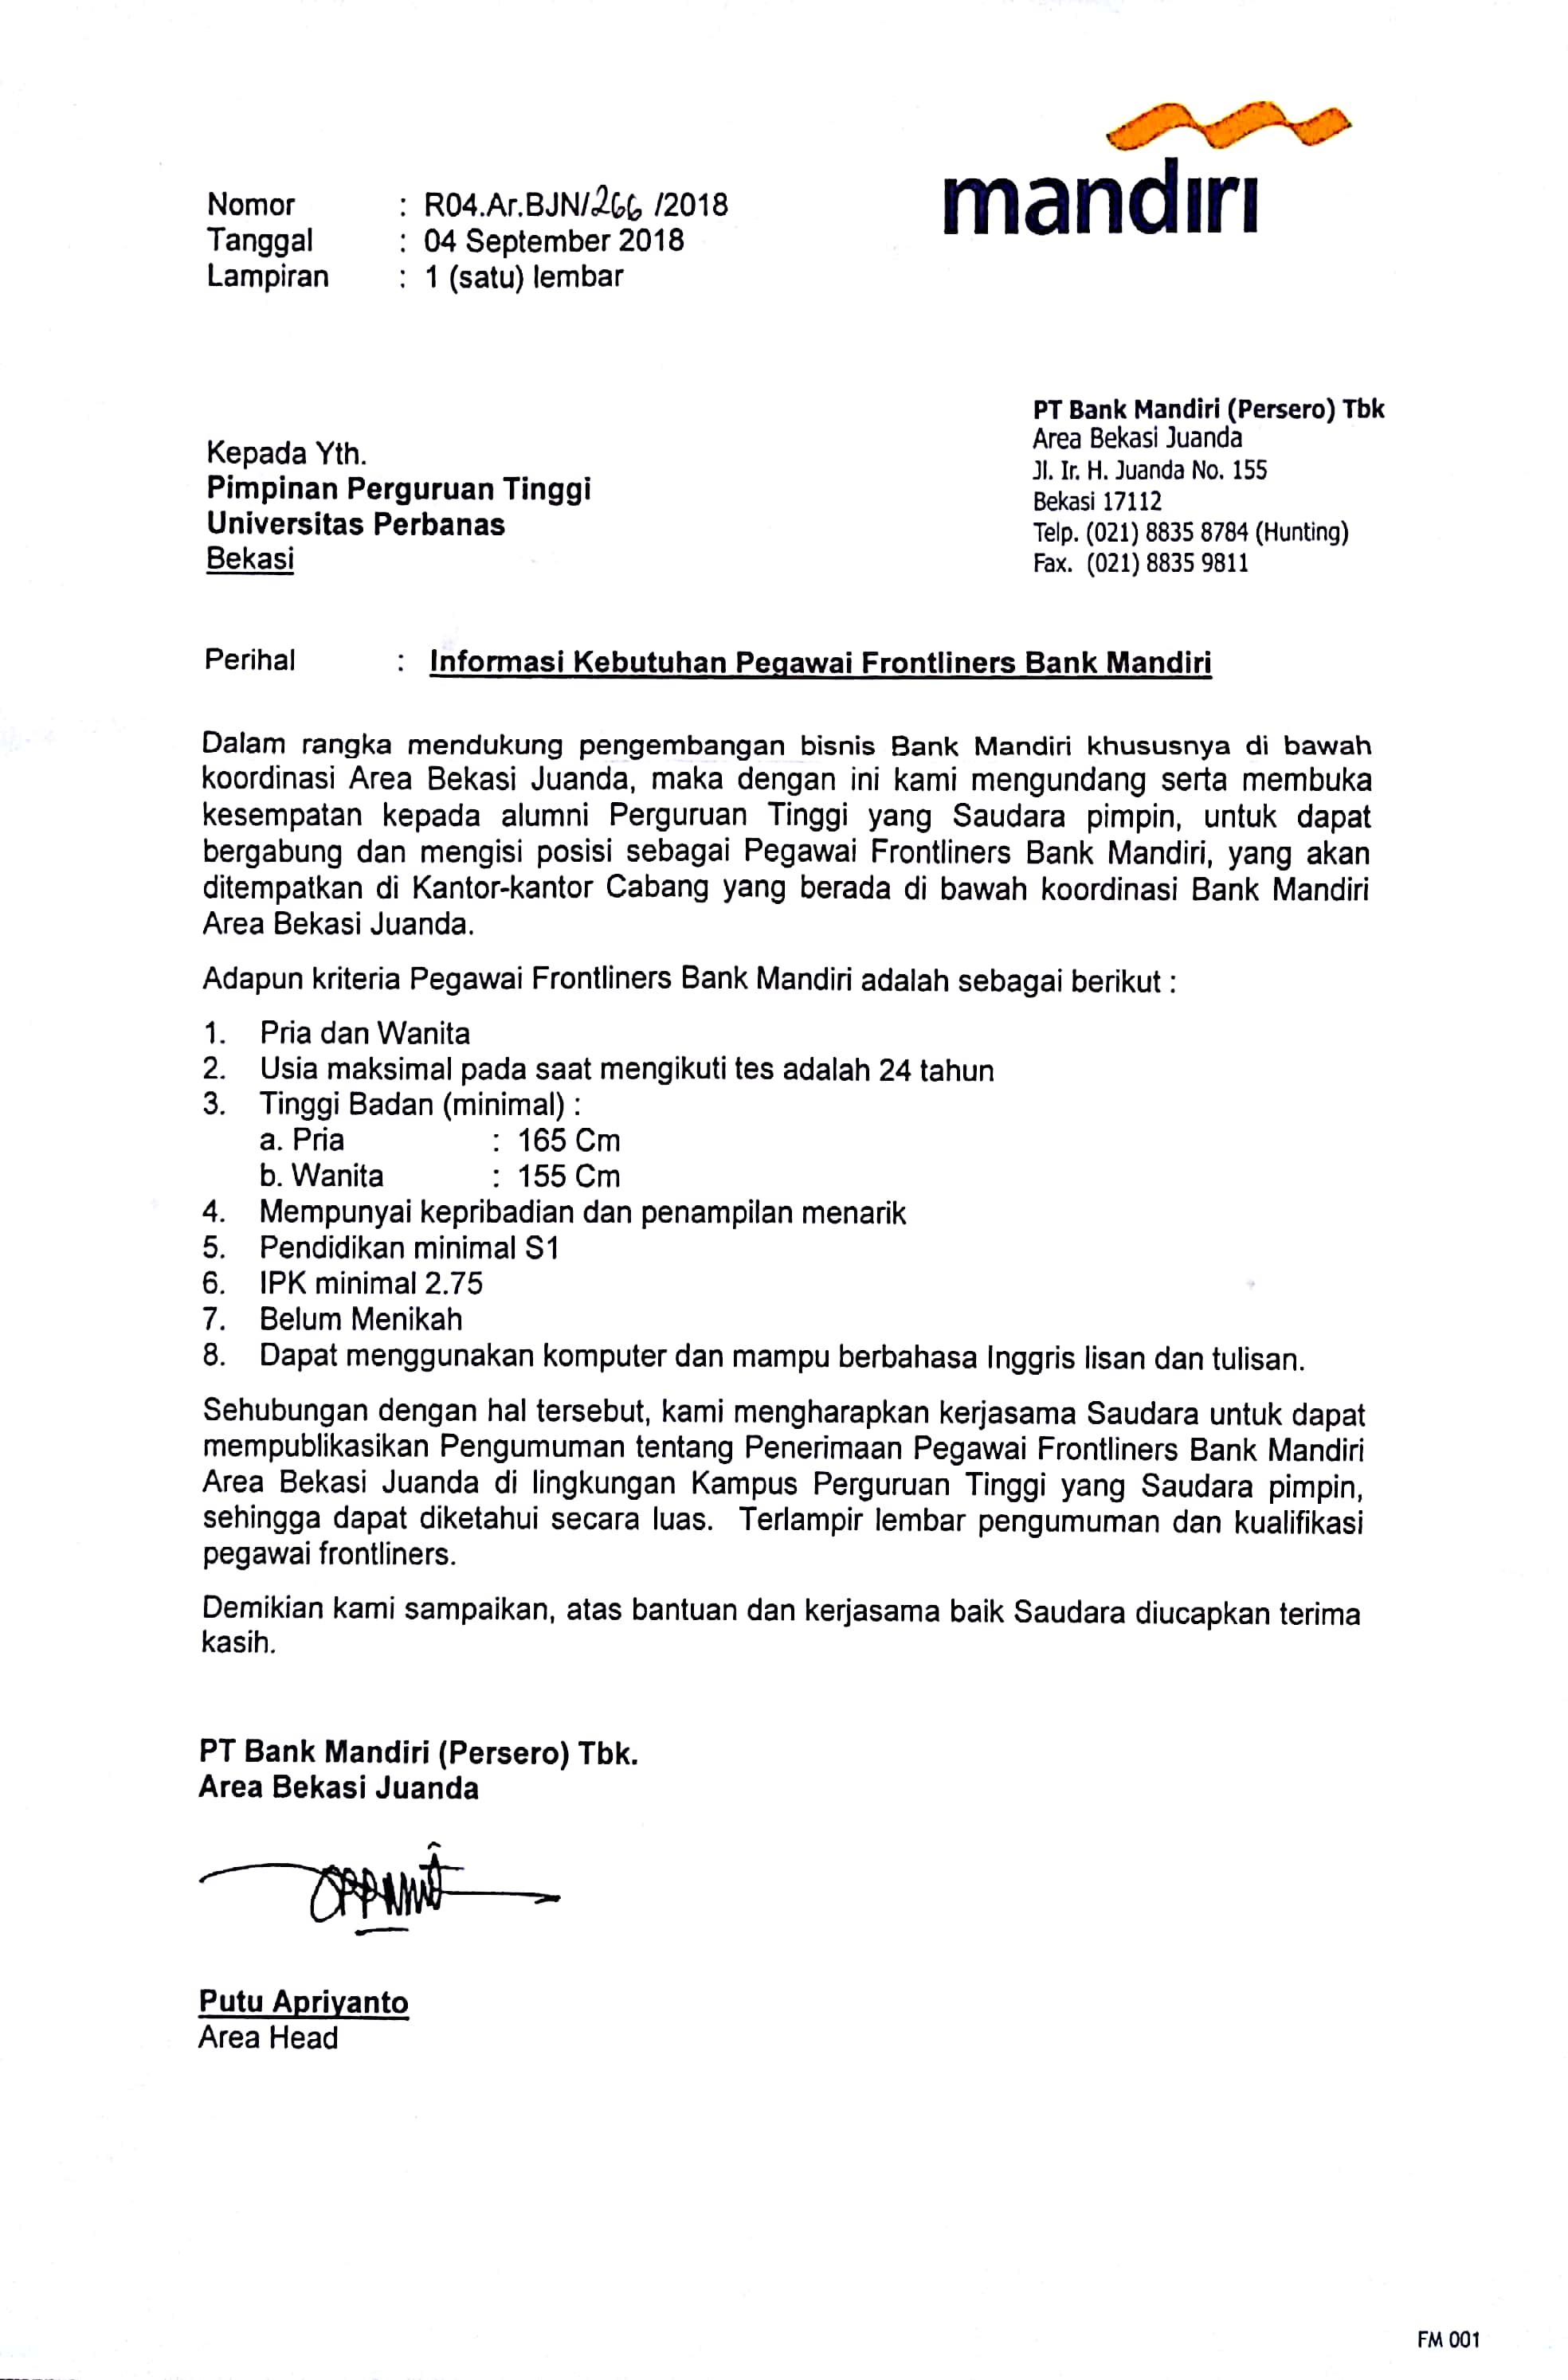 Informasi Rekrutment di PT. Bank Mandiri (Persero) Tbk